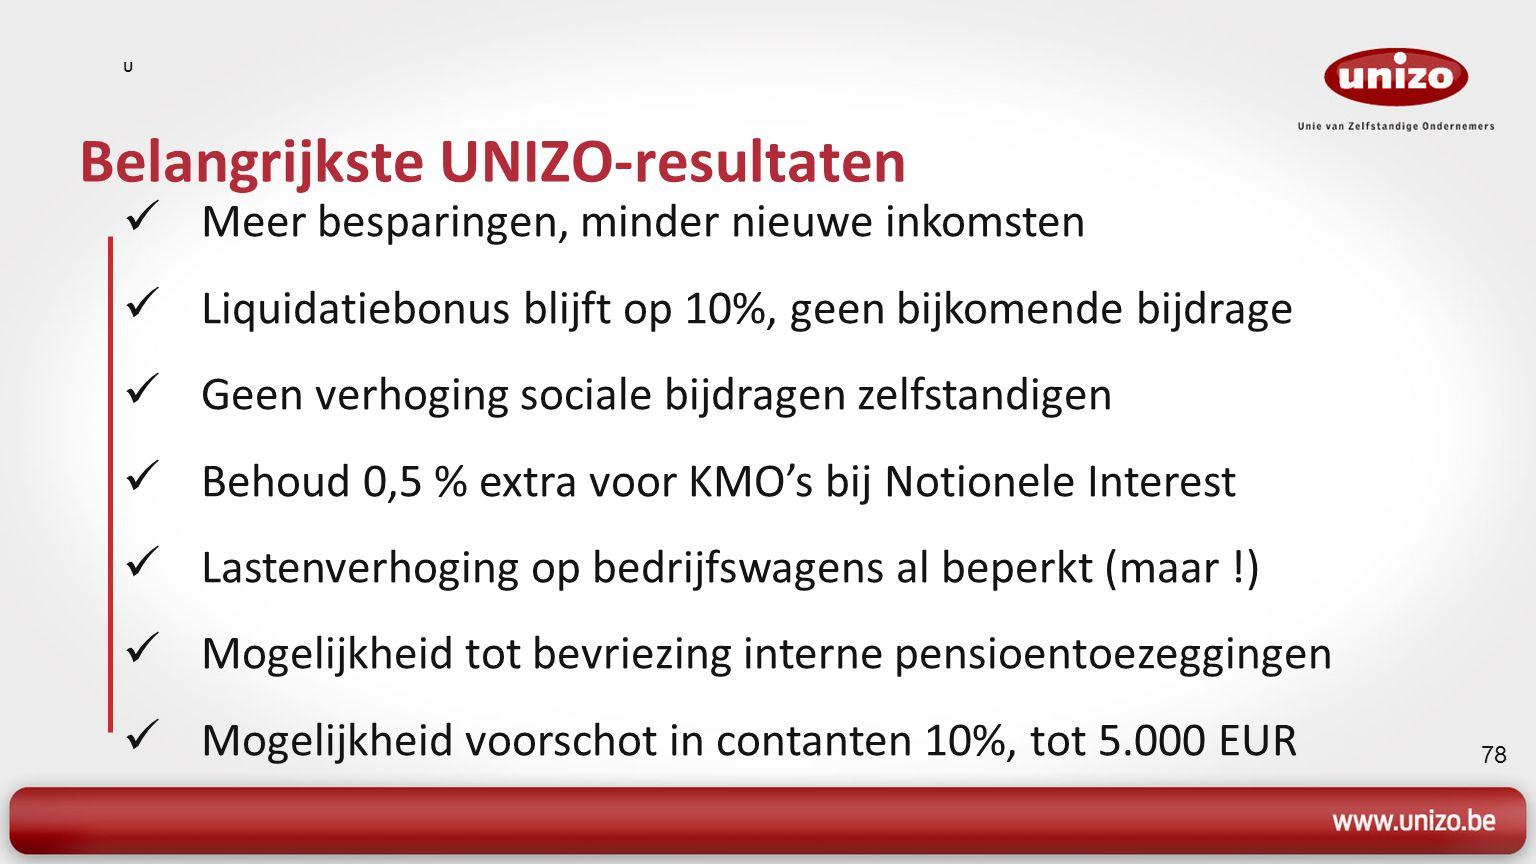 Kristof Willekens UNIZO- Studiedienst Spastraat 8 1000 Brussel Telefoon: 02/238.05.31 Fax: 02/238.07.94 E-mail: kristof.willekens@unizo.be http://www.unizo.bekristof.willekens@unizo.be